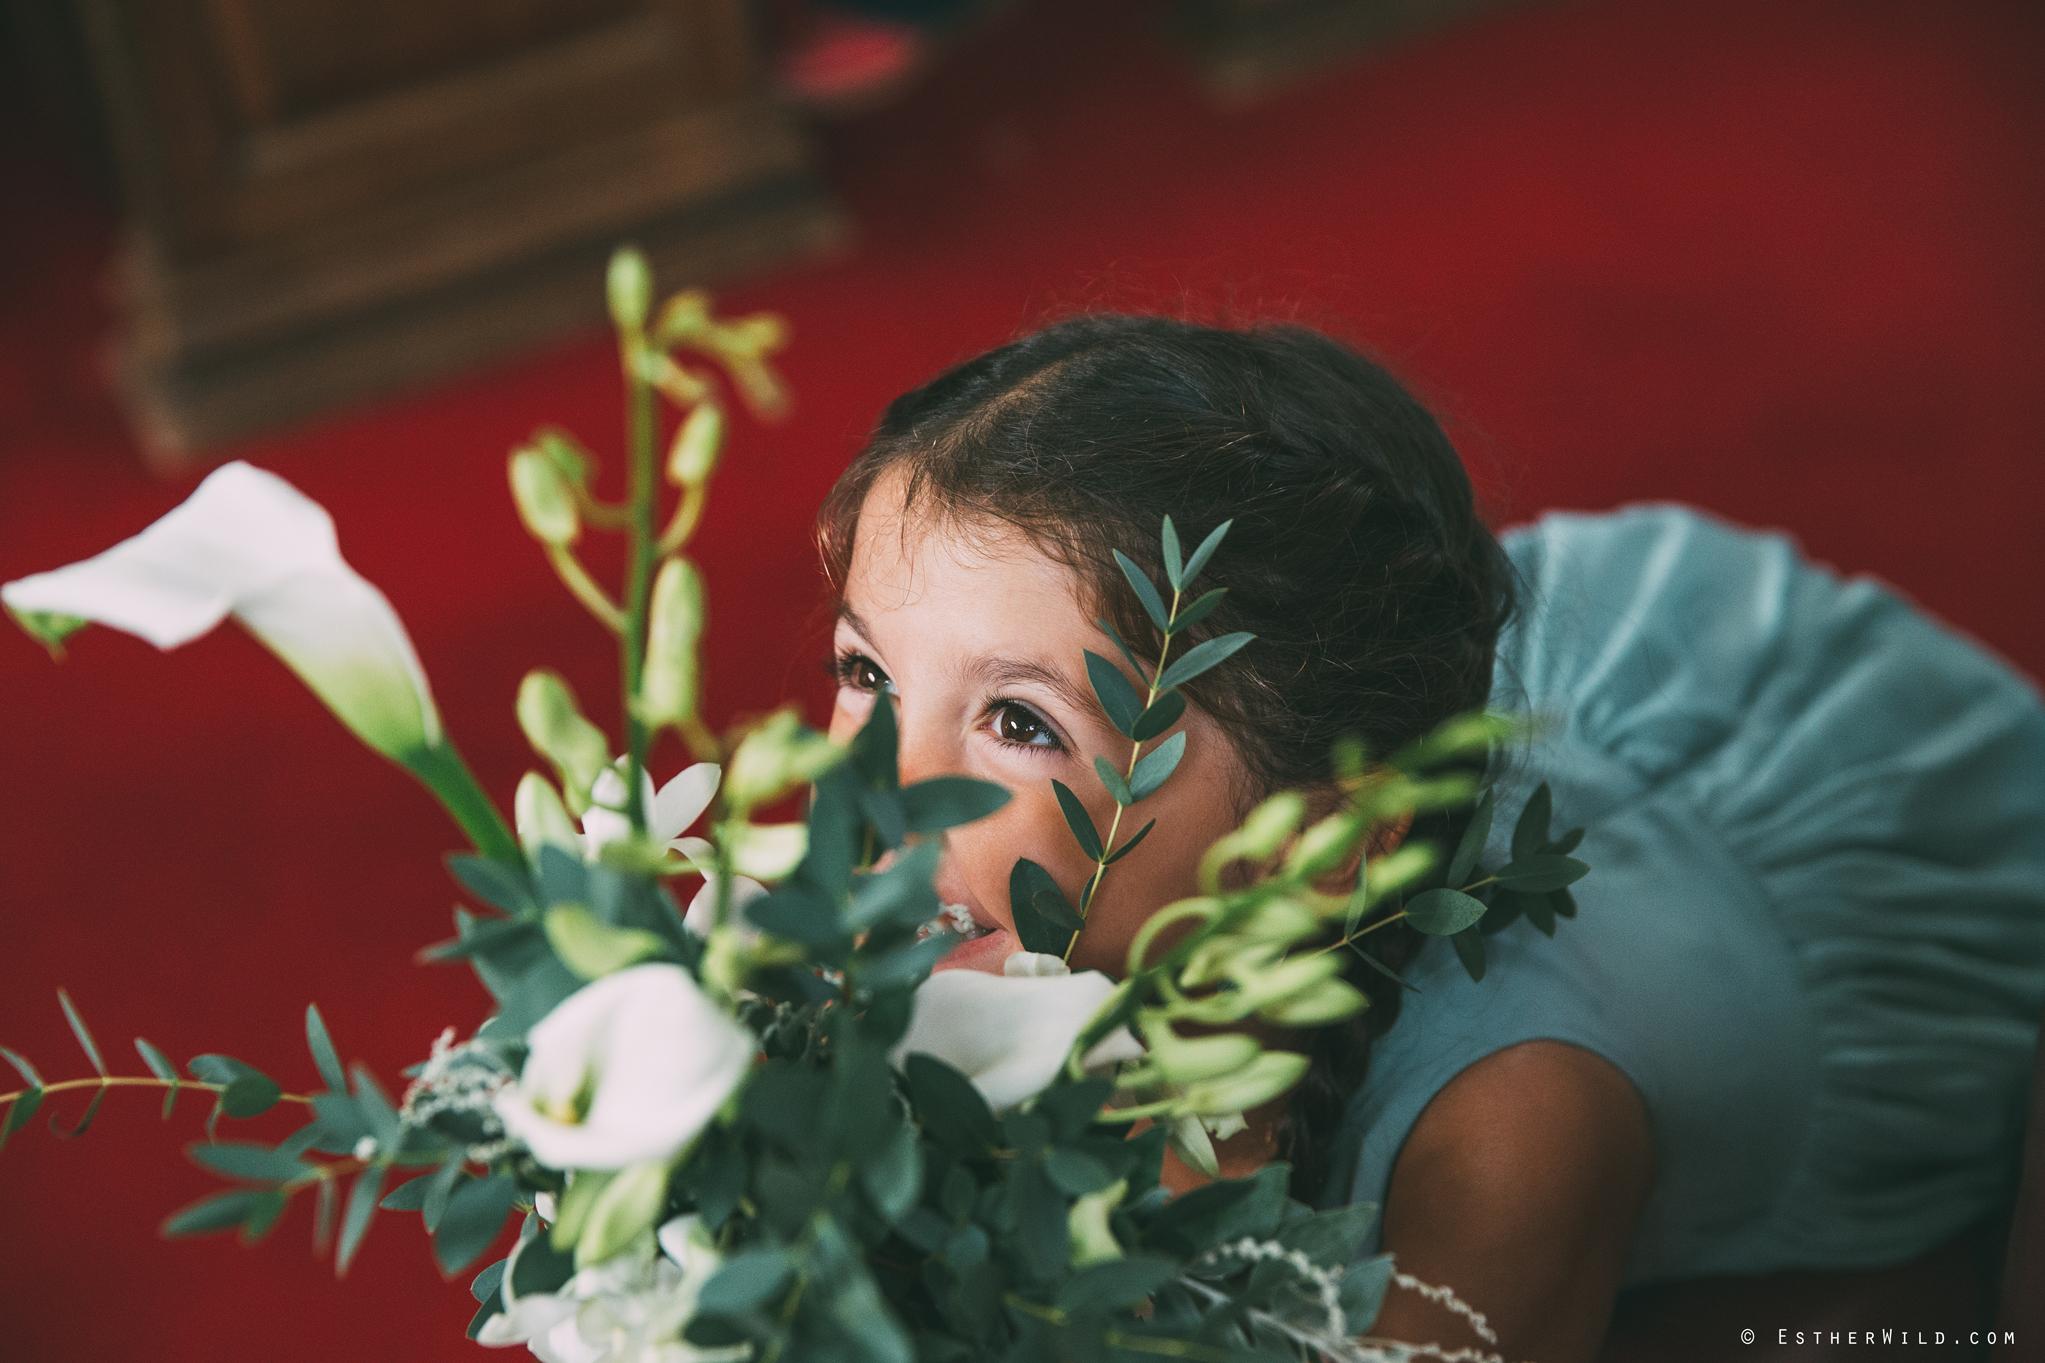 Islington_Town_Hall_Wedding_London_Photographer_Esther_Wild_IMG_4875.jpg